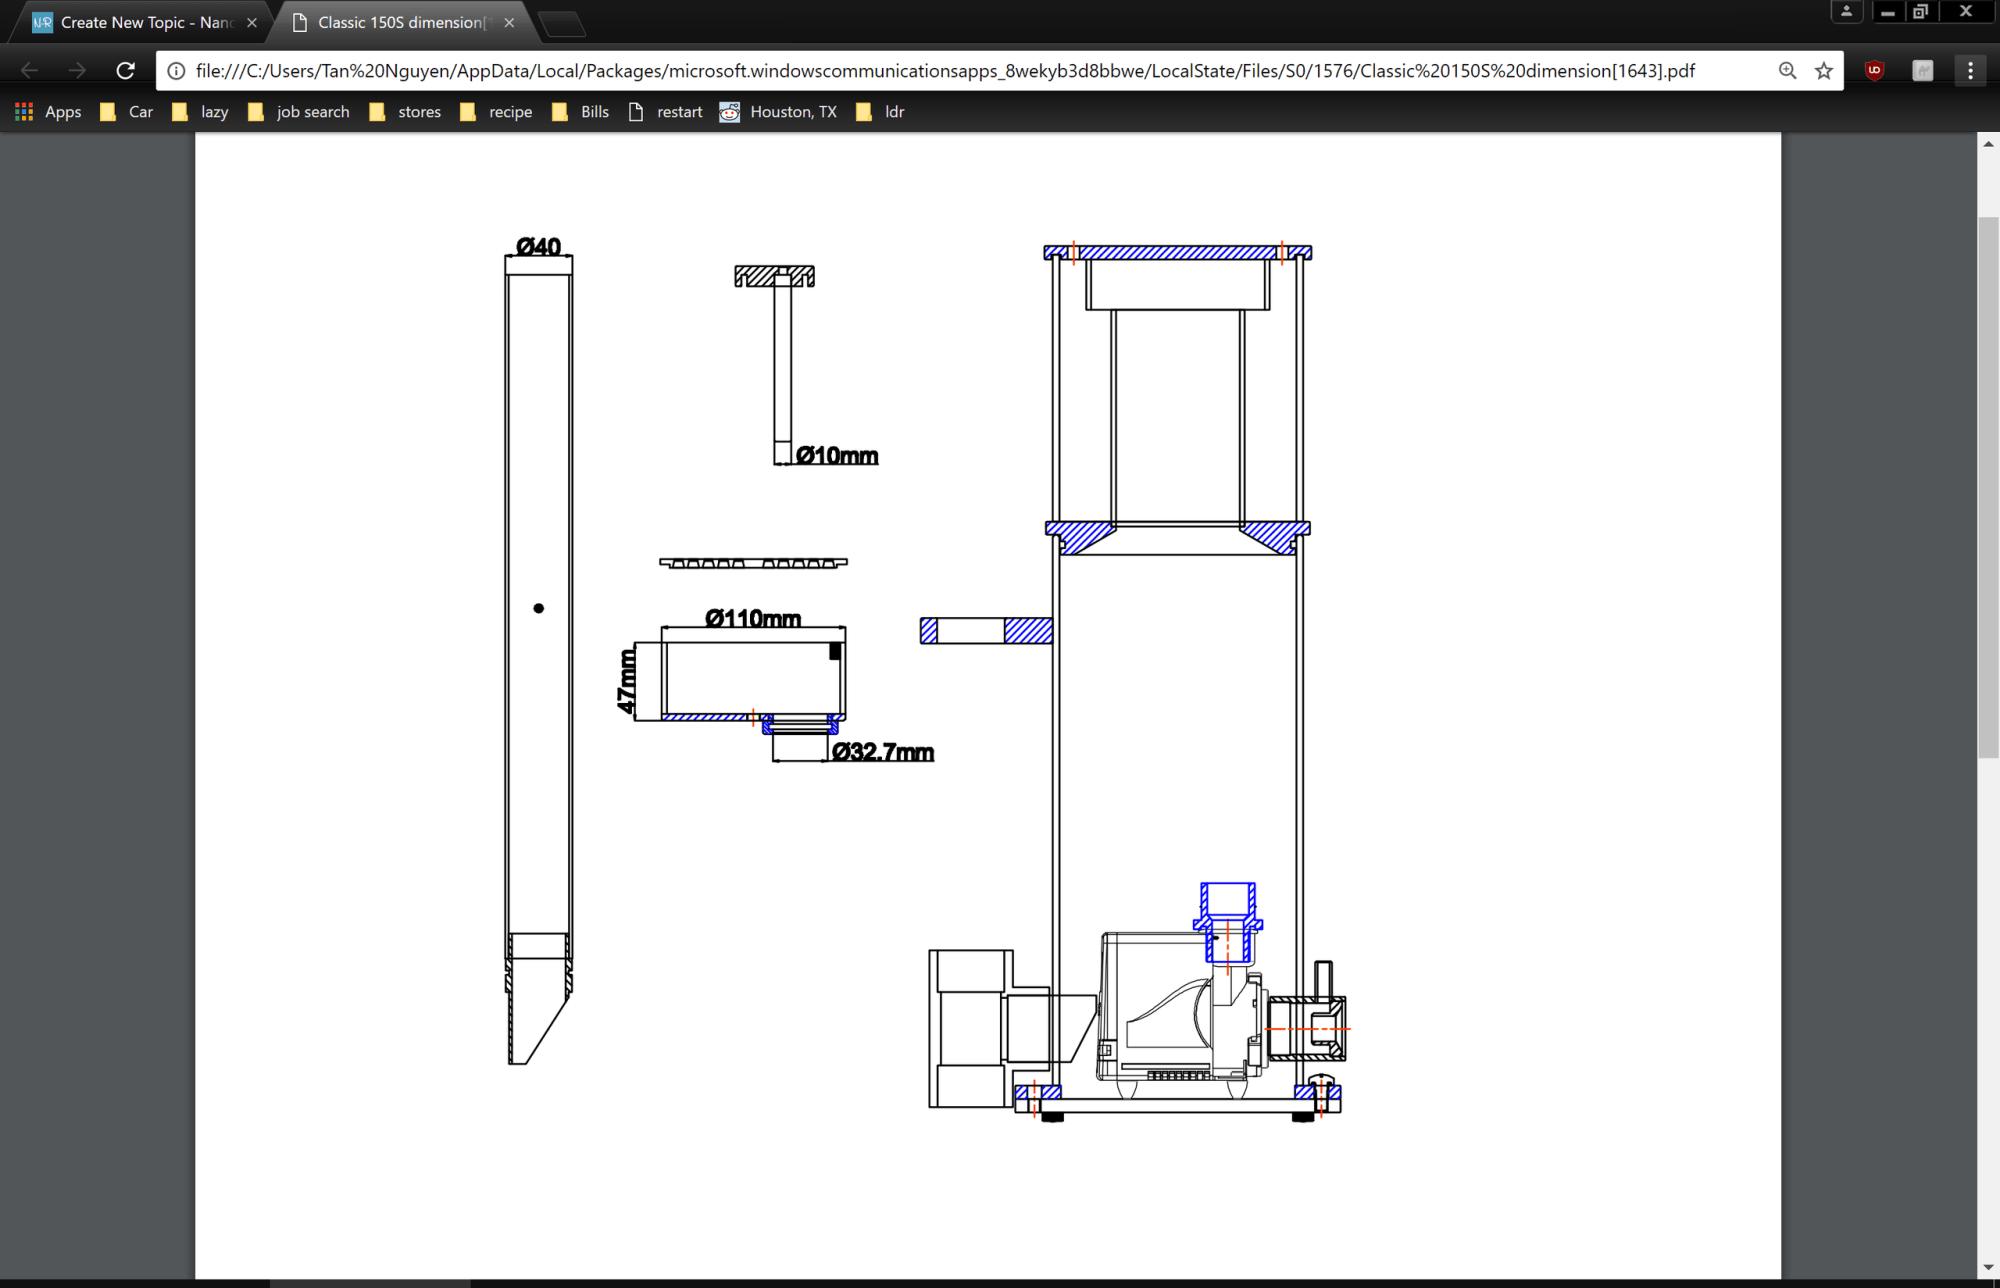 hight resolution of schematics thumb png d03c5a546c5d79a0fdd79ceeeed831fc png